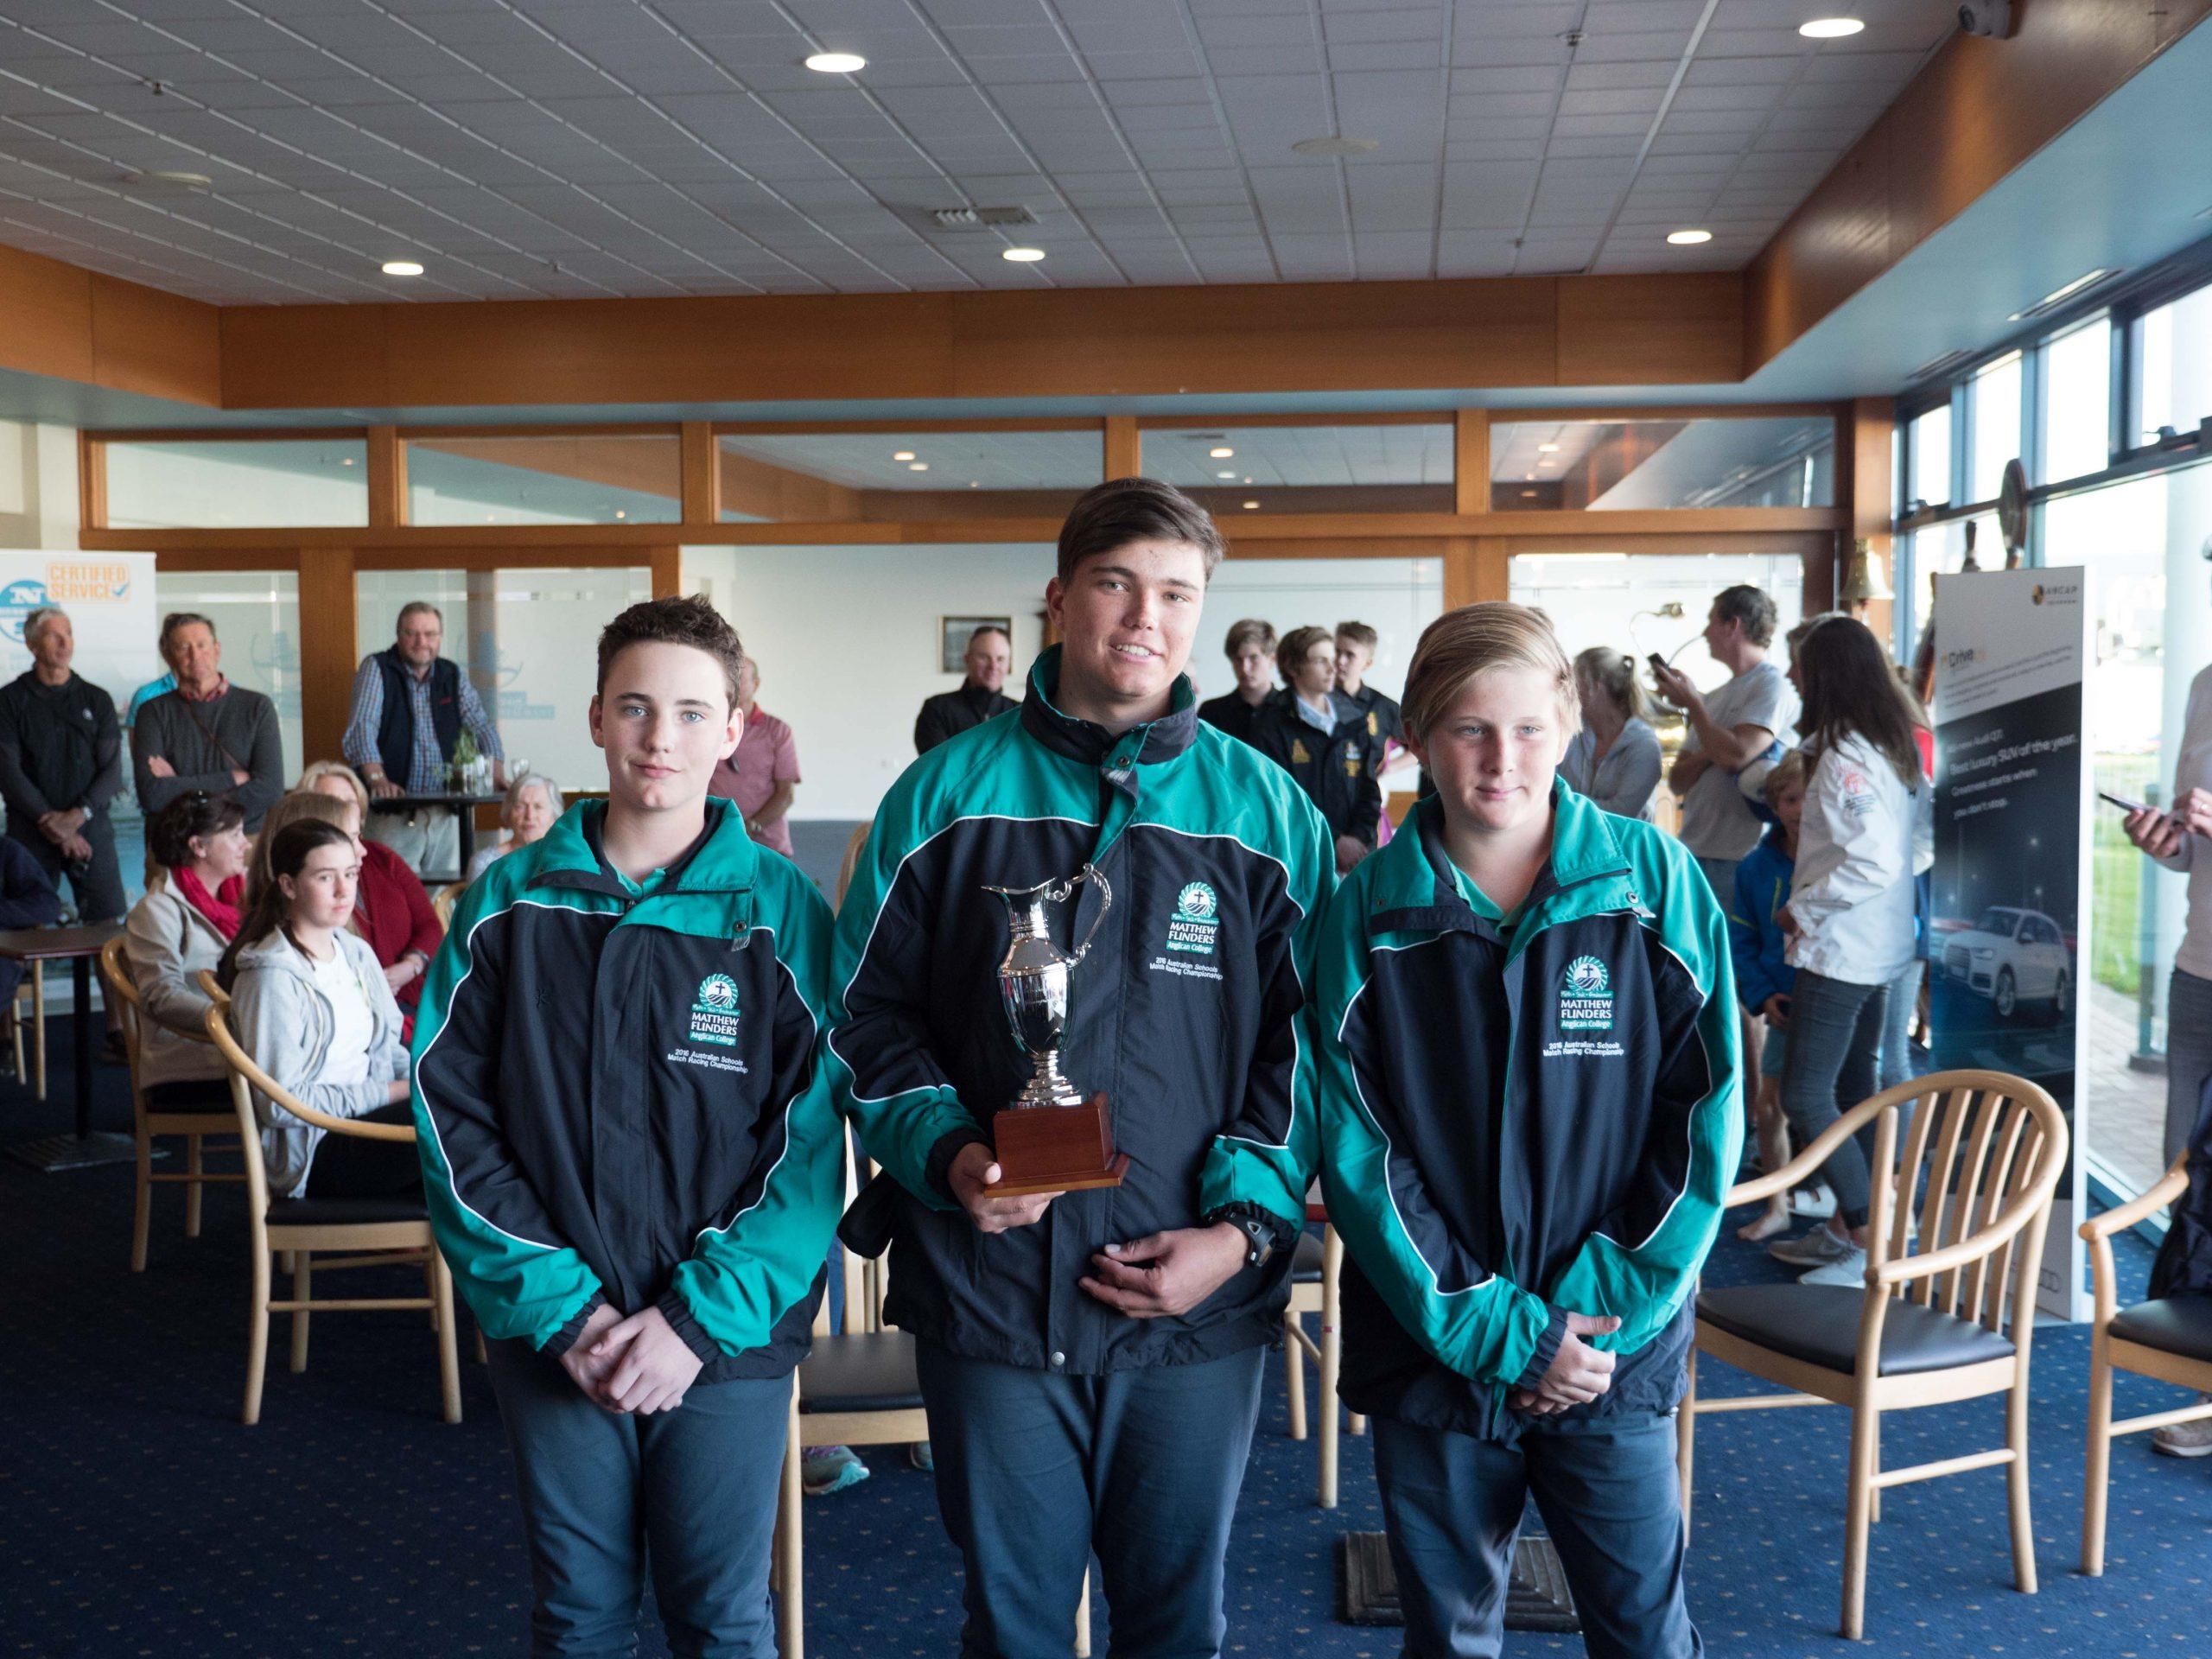 James Hodgson and his winning crew. Photo Zac Pullen